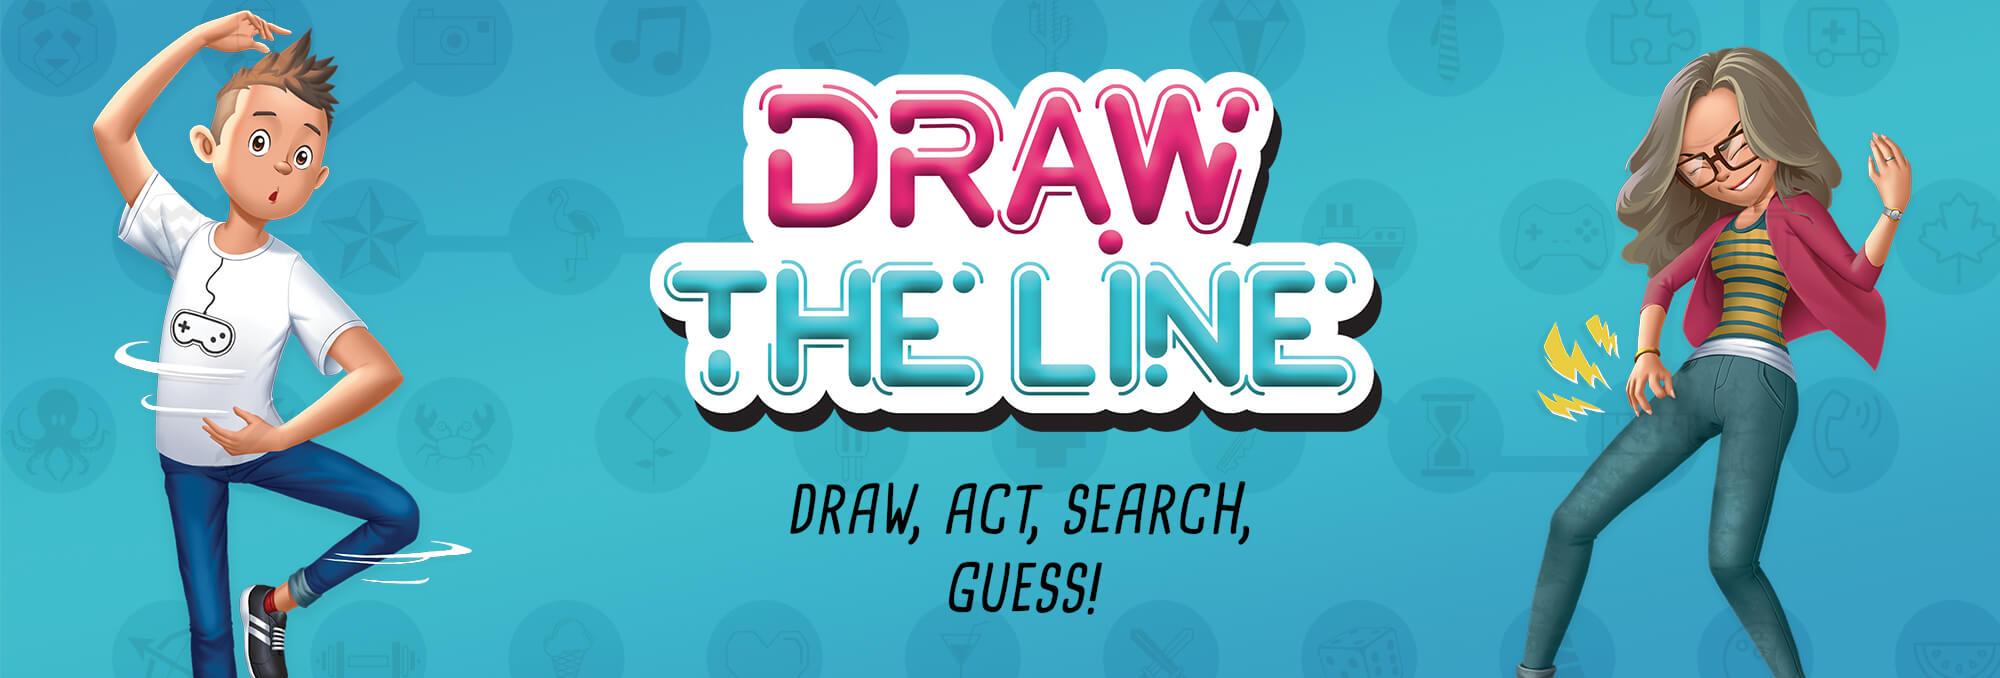 EN-Slide-Draw-the-line-Website